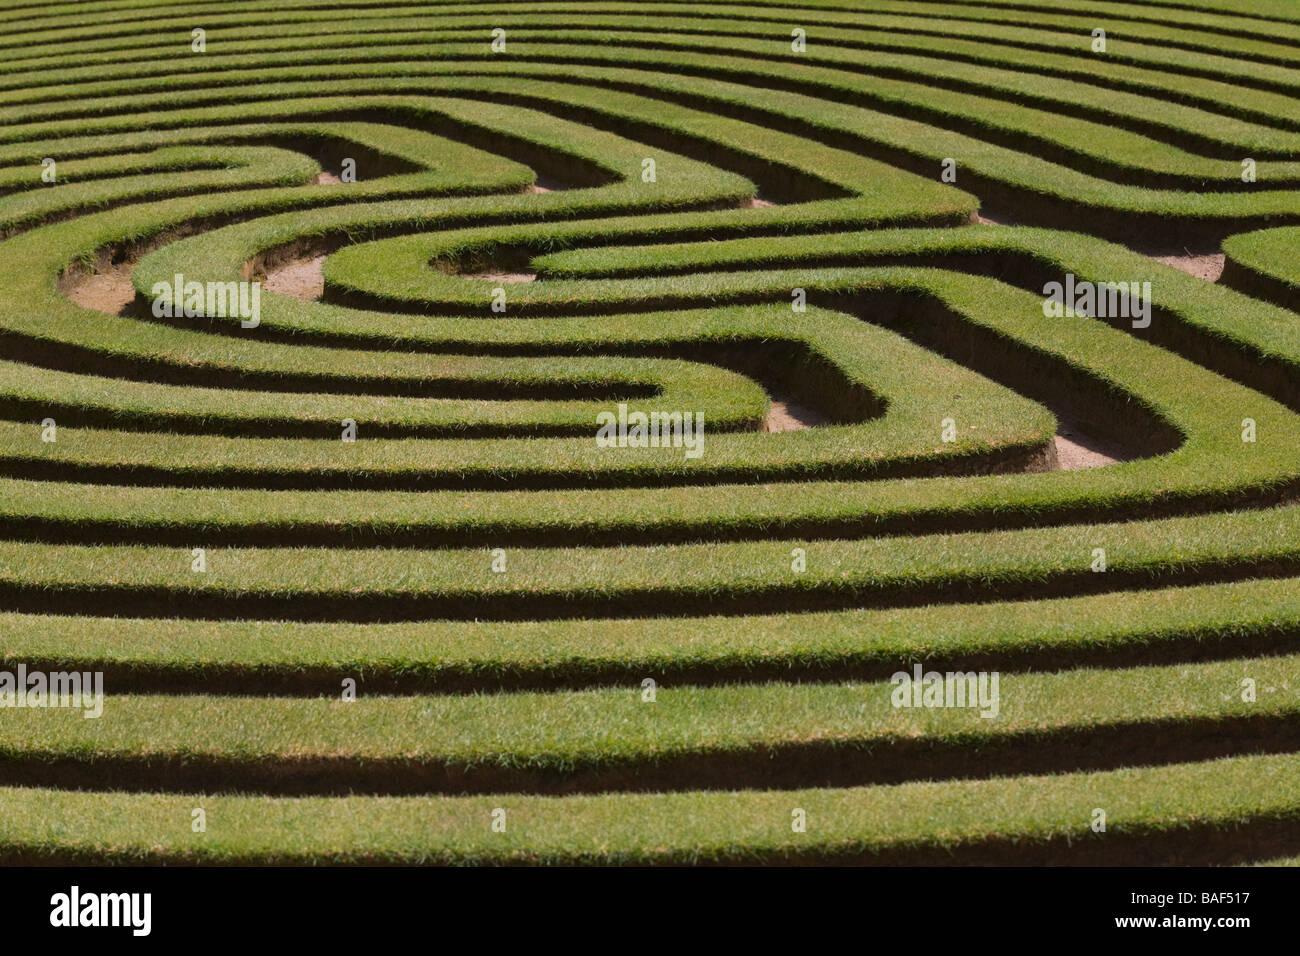 Lawn Maze, Cockington Green Gardens, Canberra, ACT, Australia - Stock Image